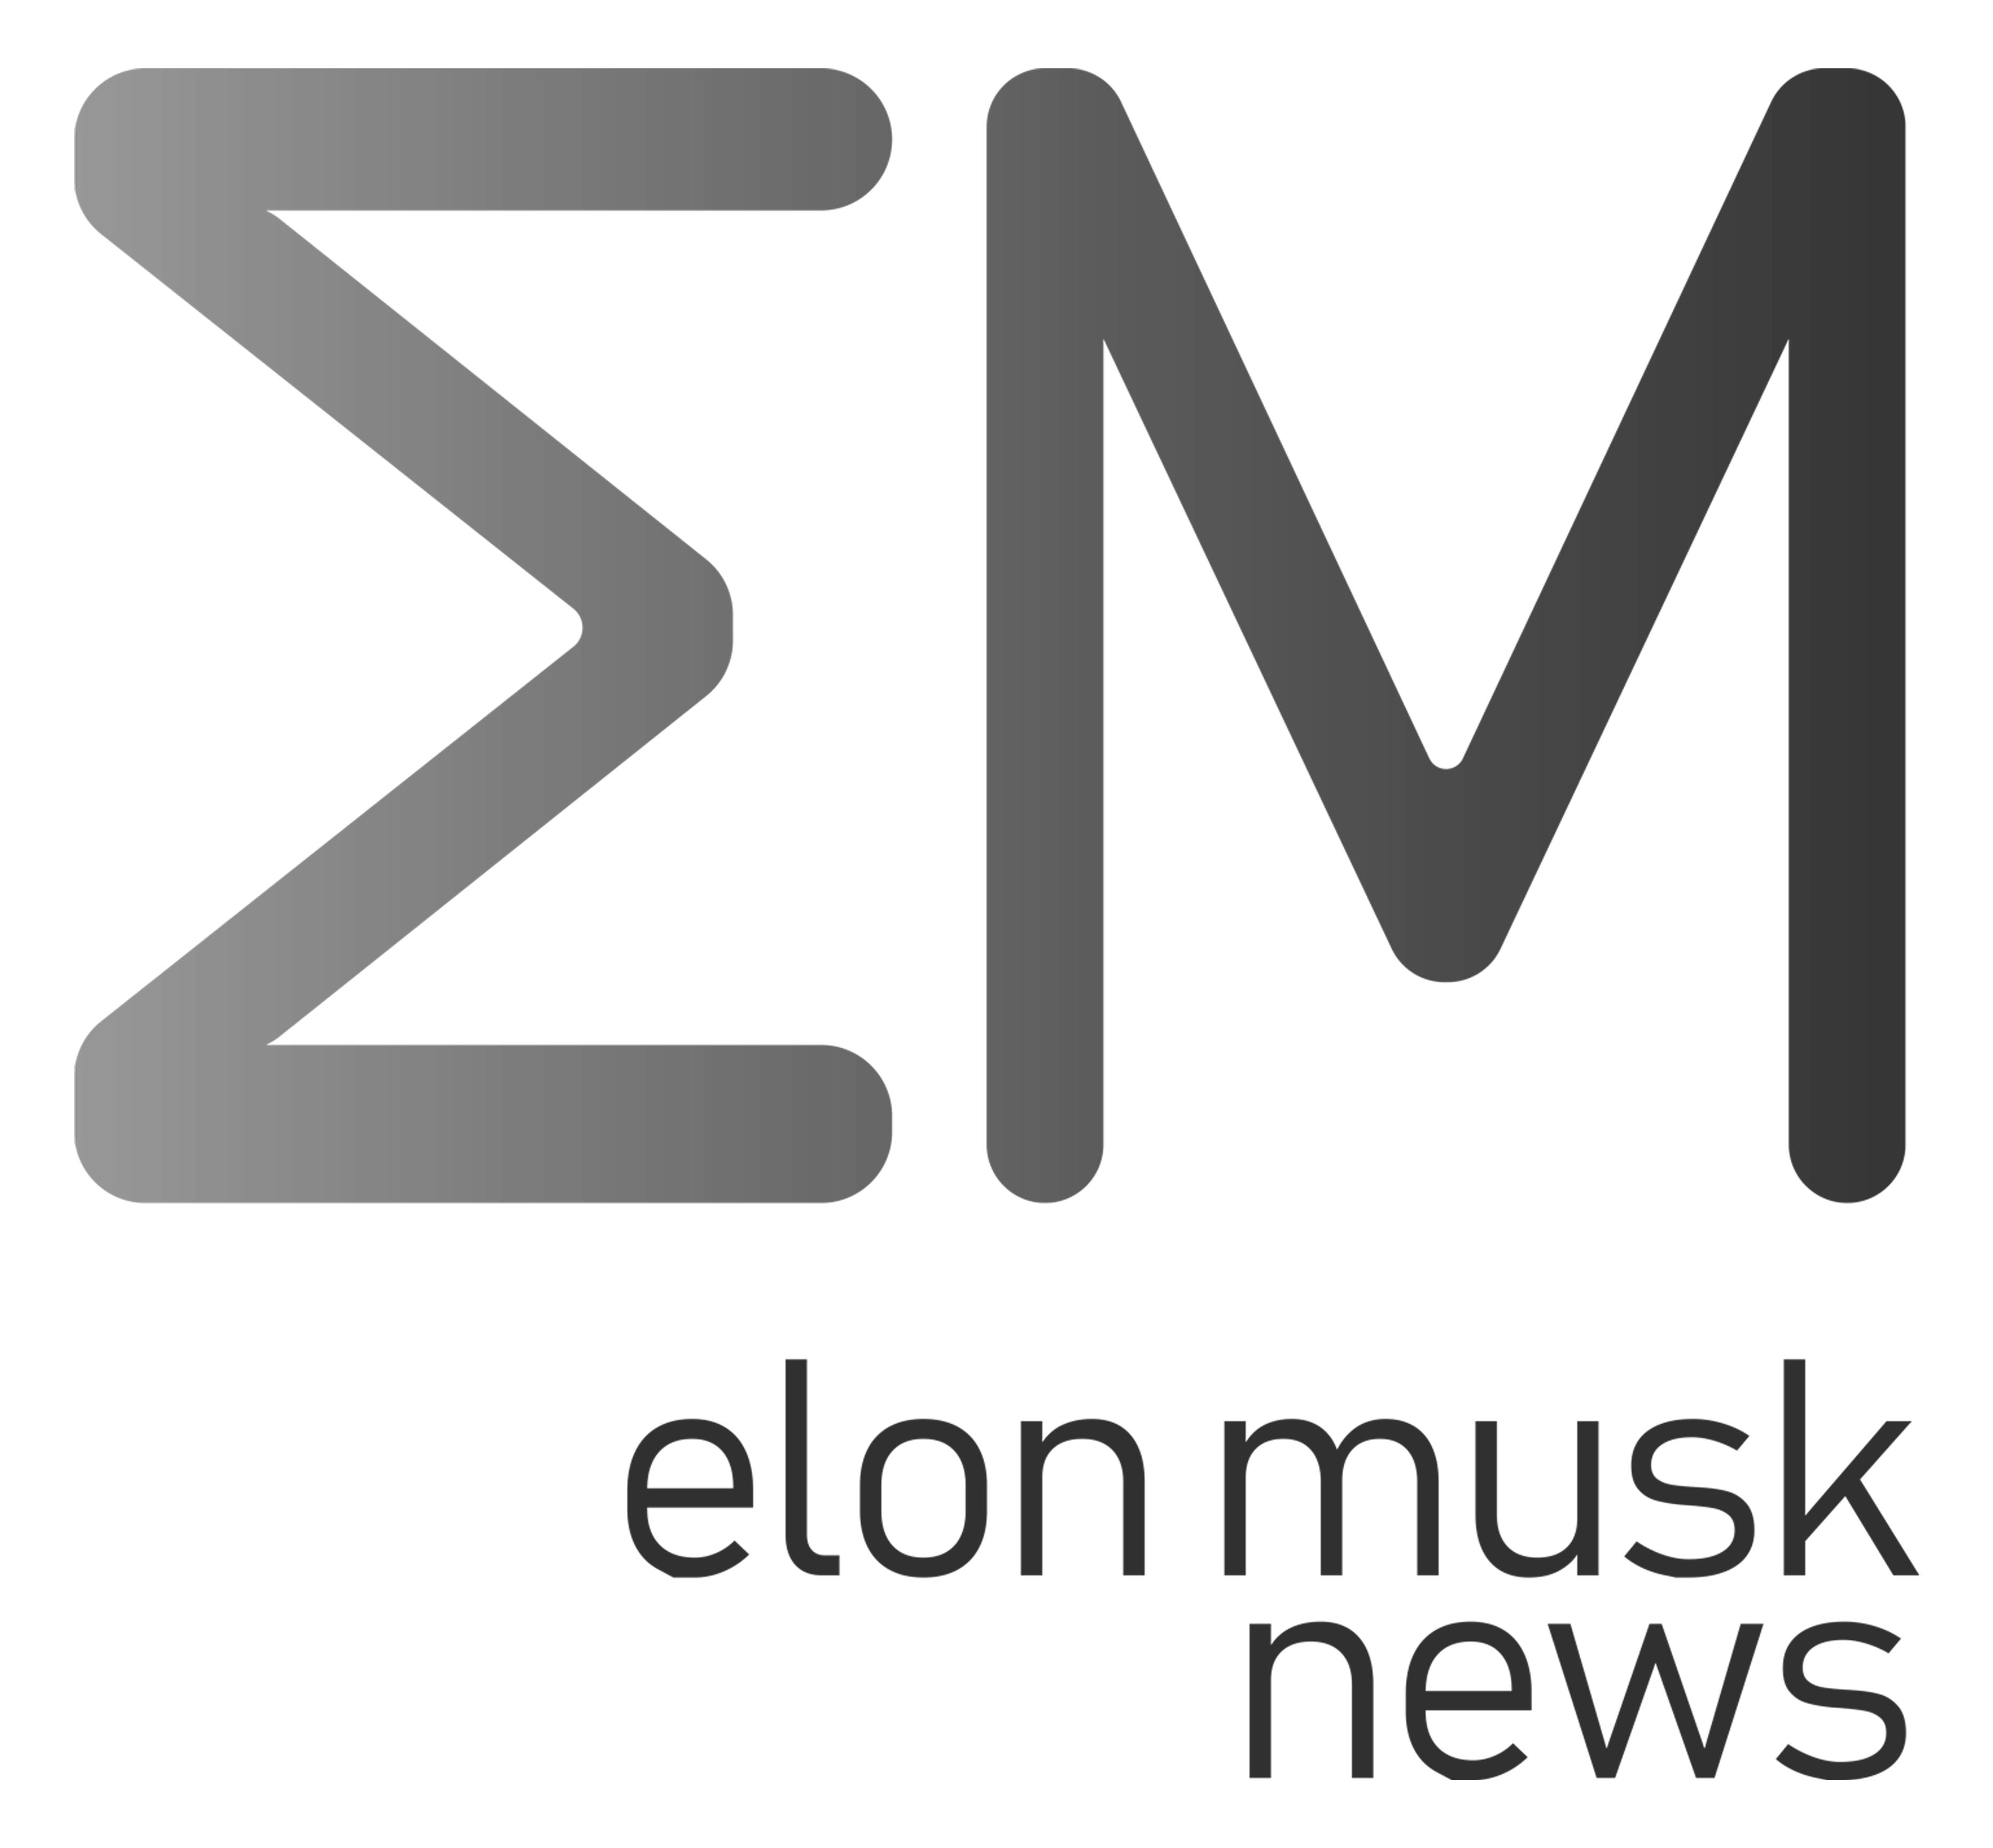 Логотип для новостного сайта  фото f_8975b6c94f4e9286.jpg